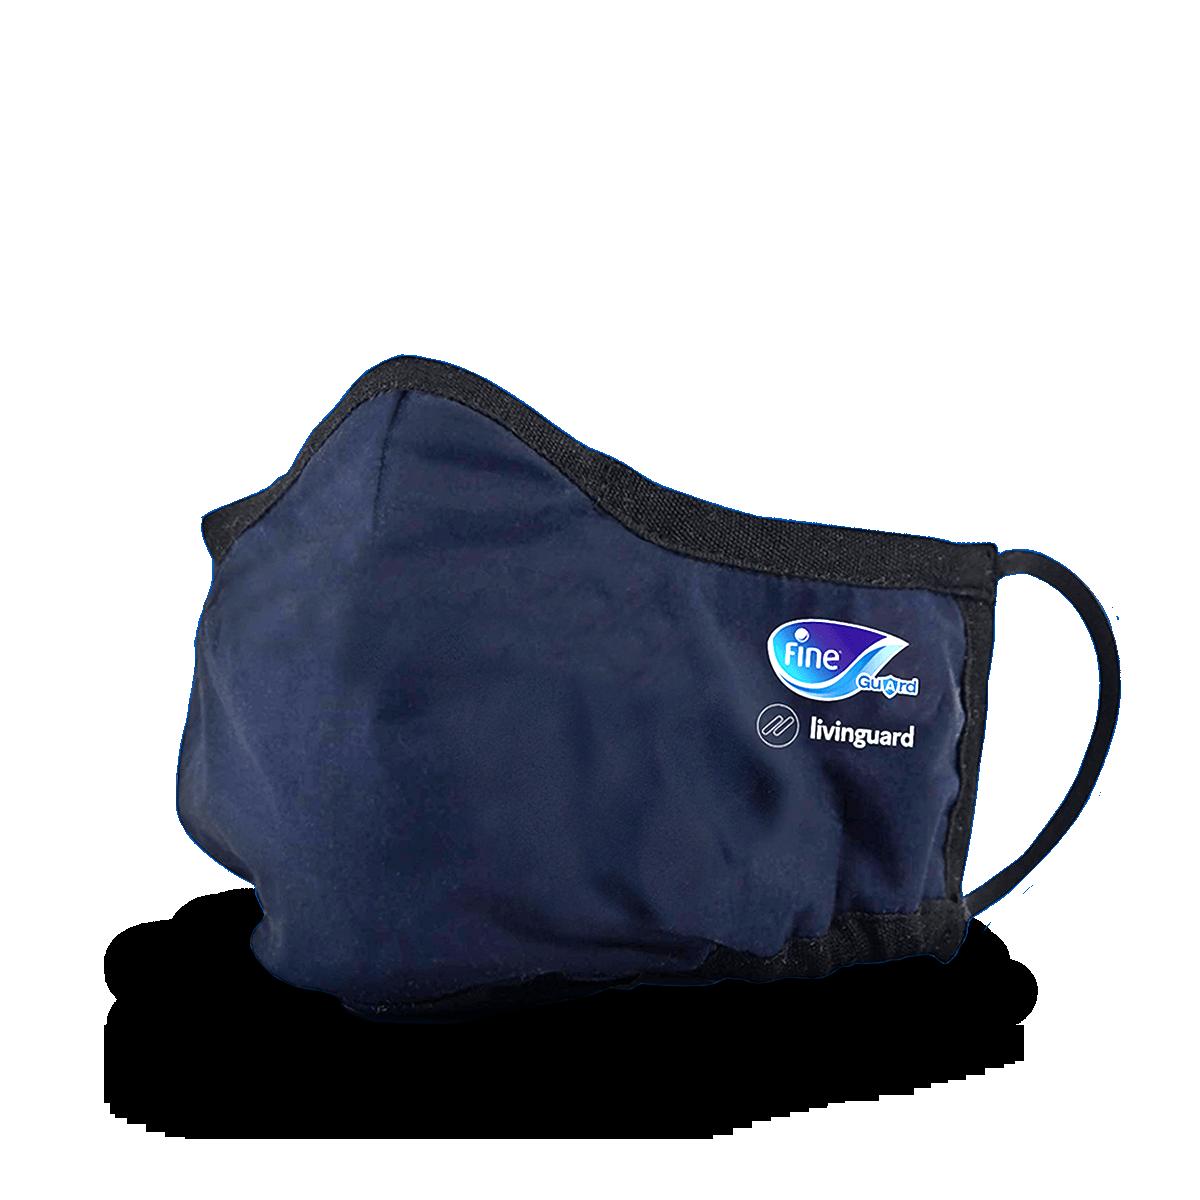 Fineguard Comfort Reusable Anti-Viral Mask